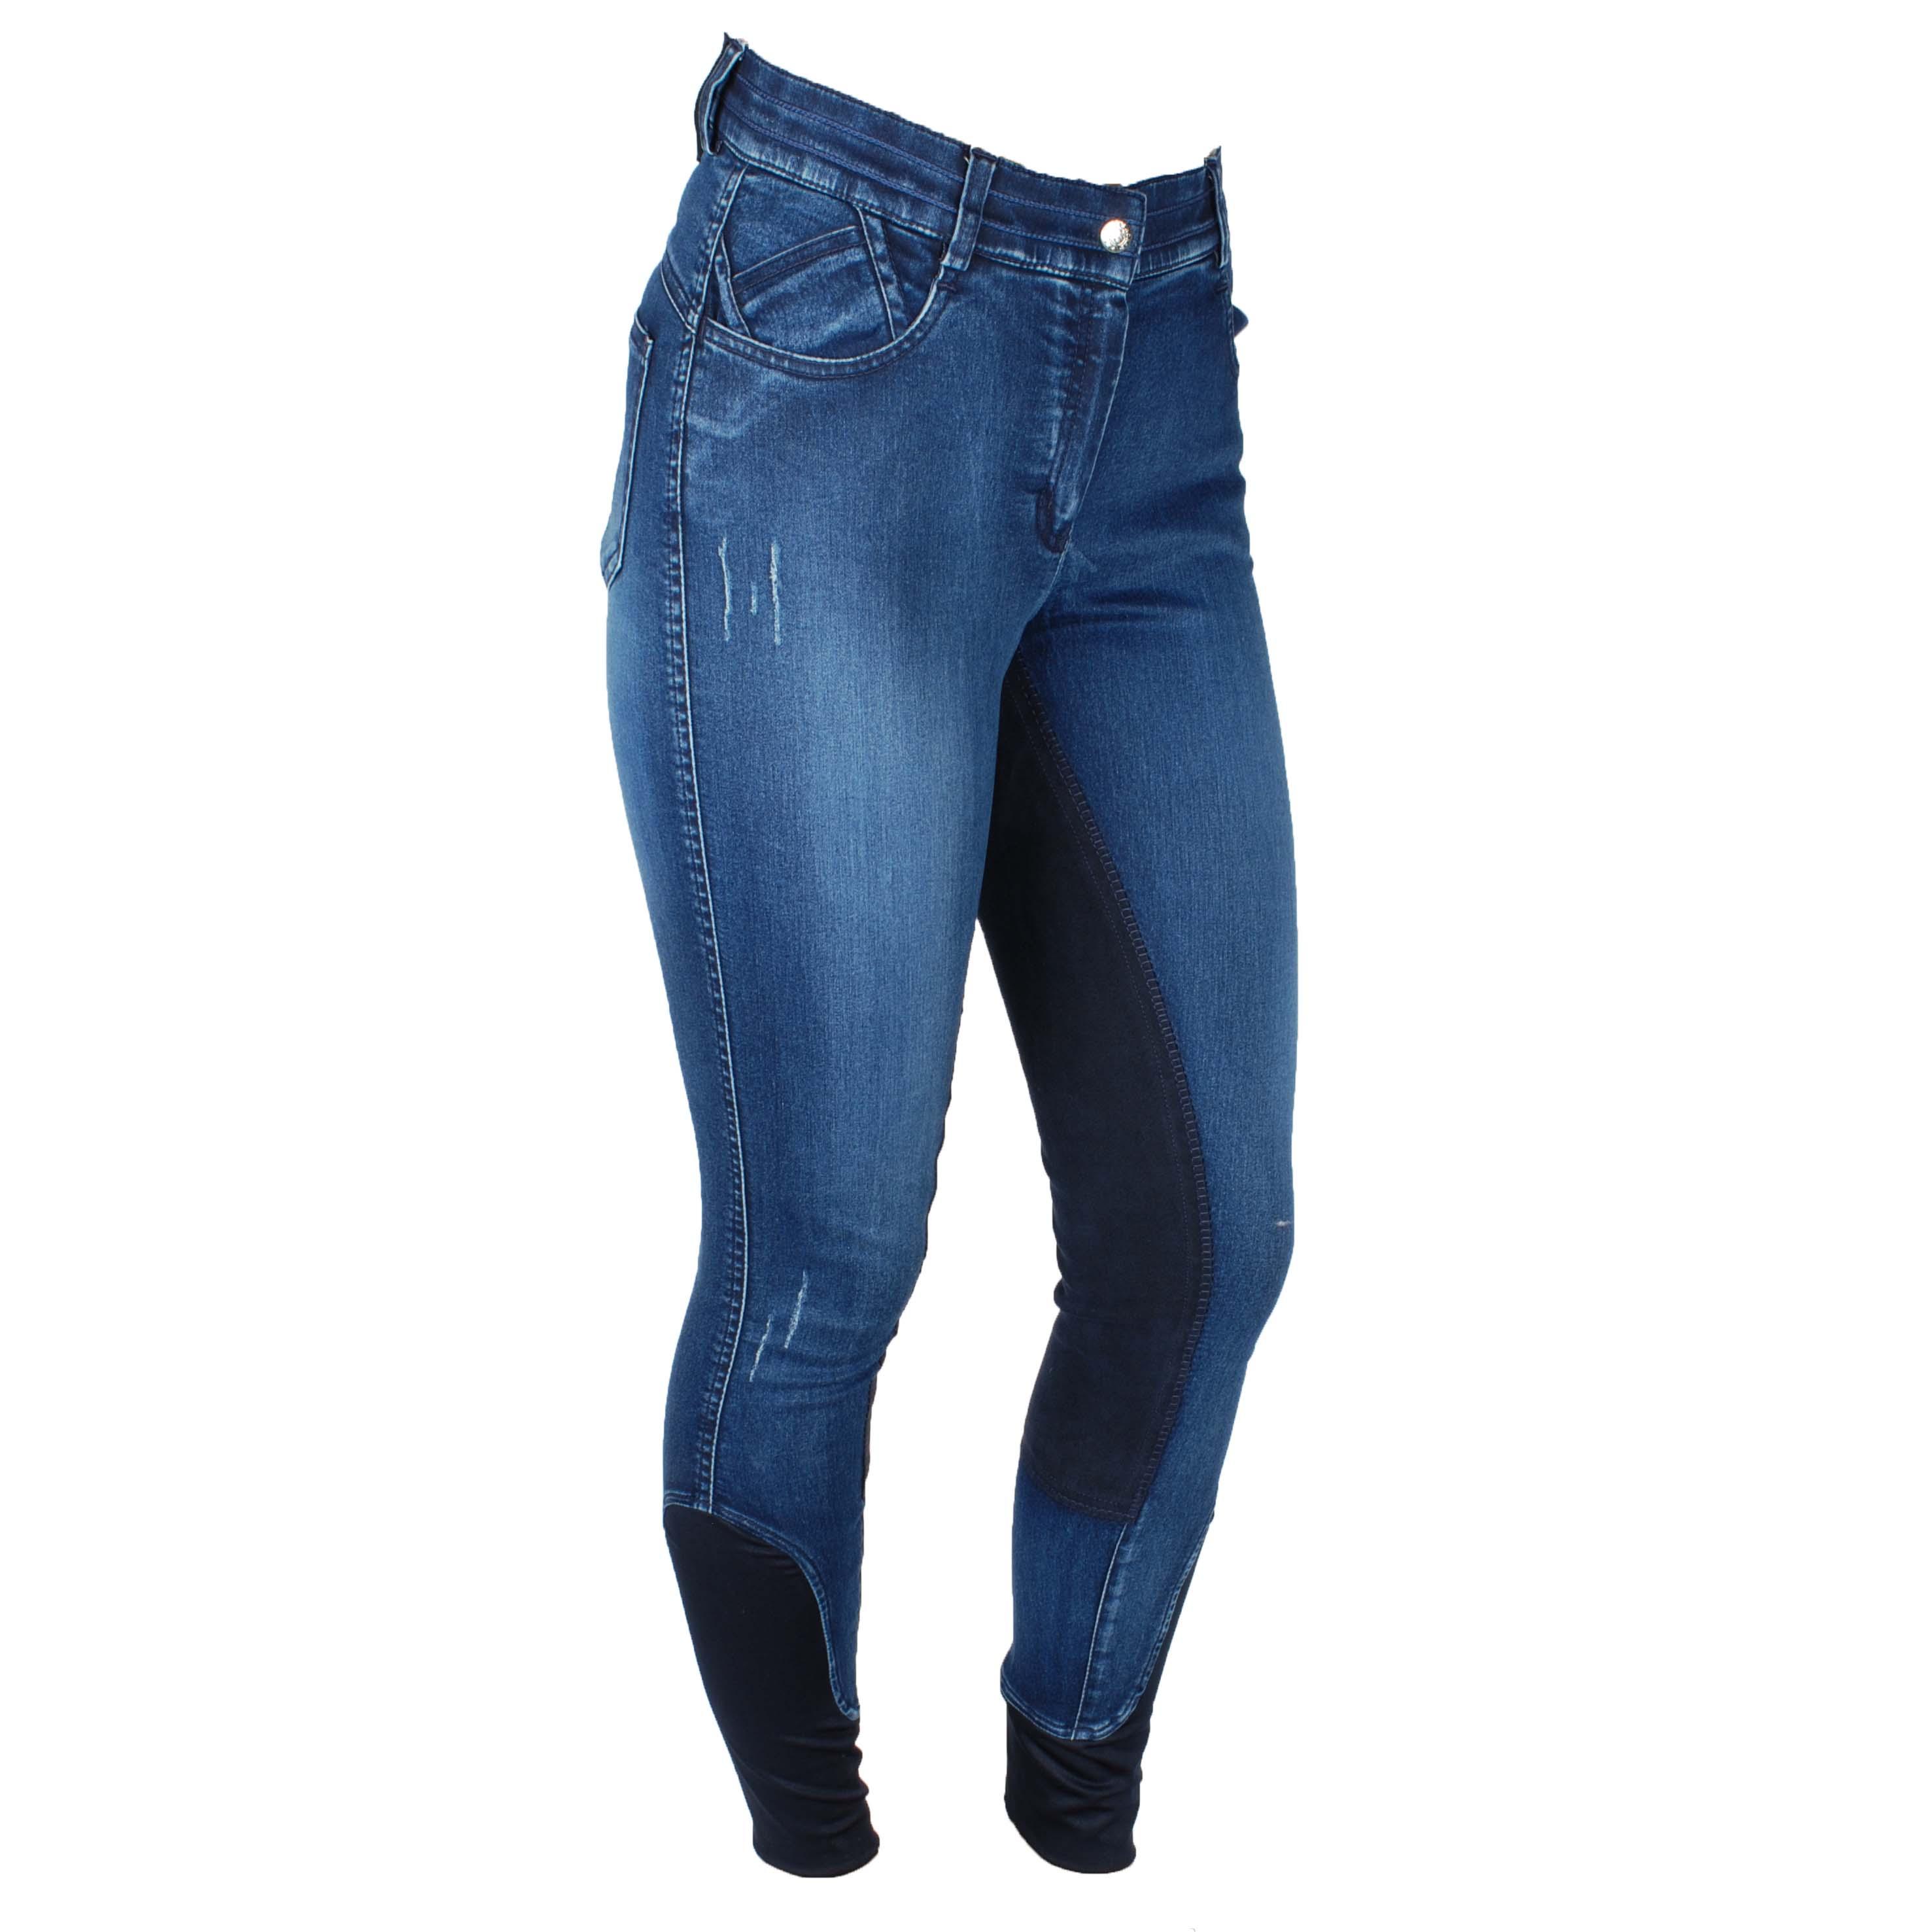 Harrys Horse Burton plus rijbroek jeans maat:40